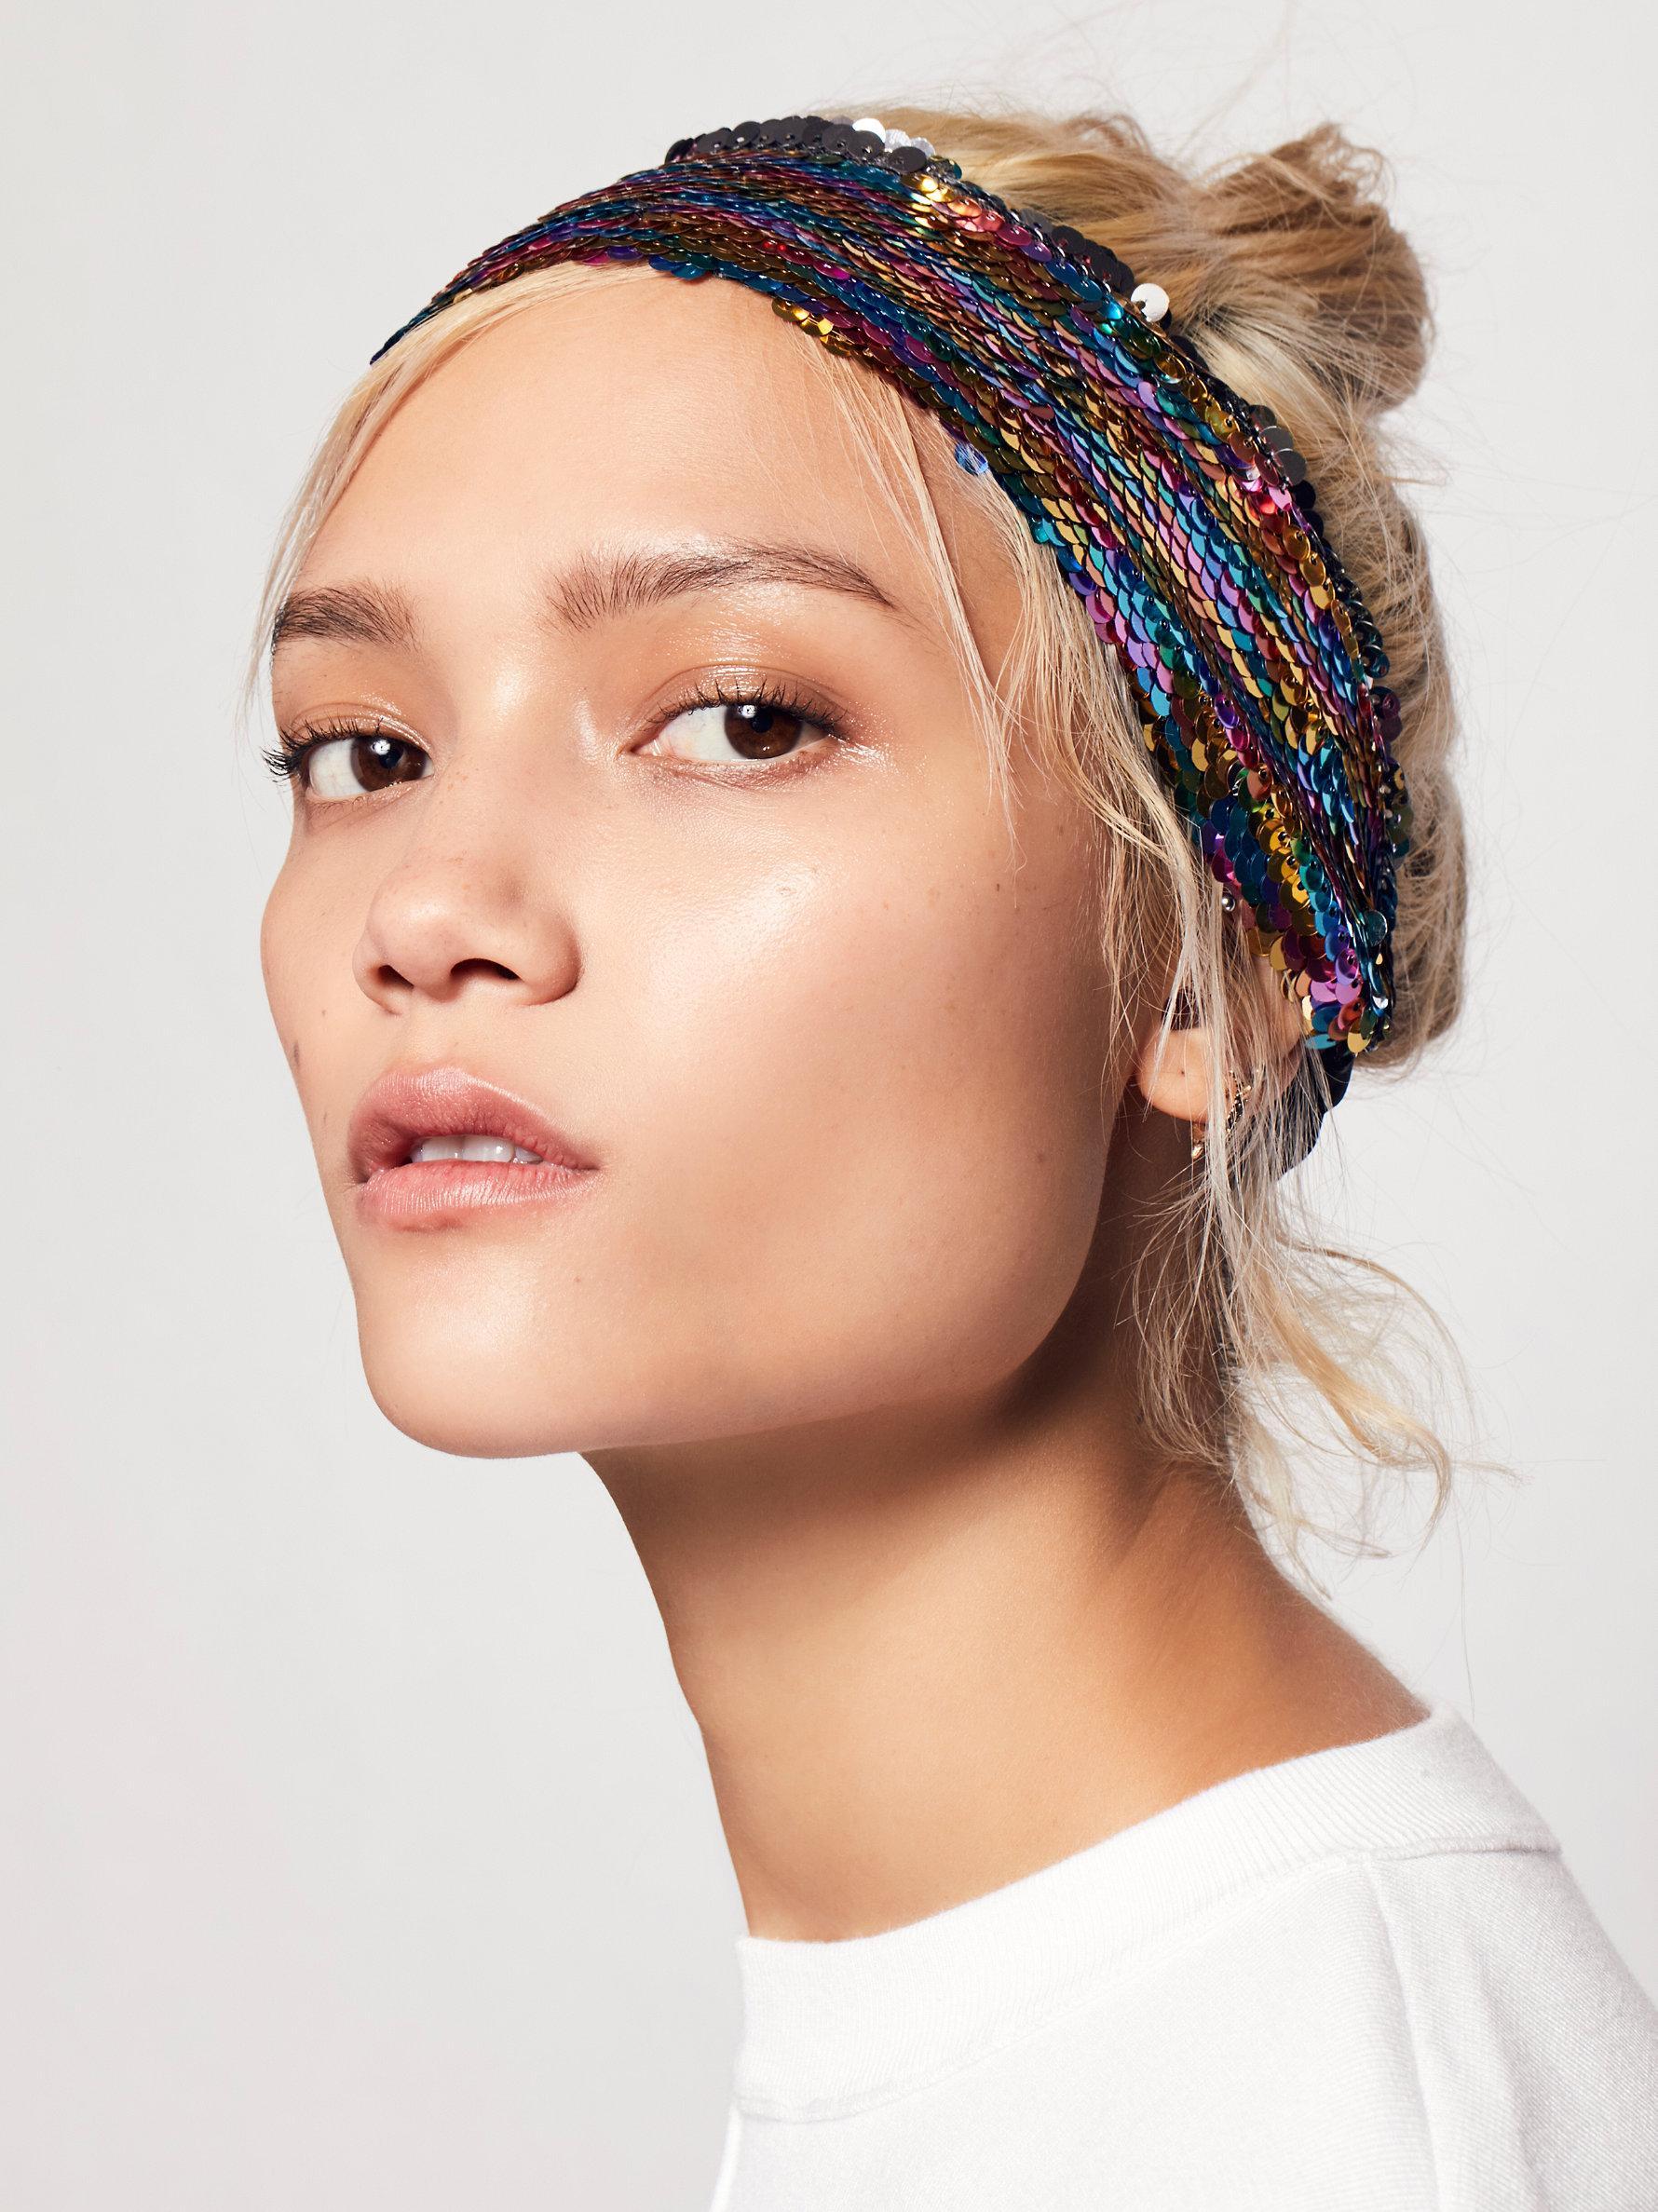 Lyst - Free People Mermaid Sequin Headband a05e12e6ba6